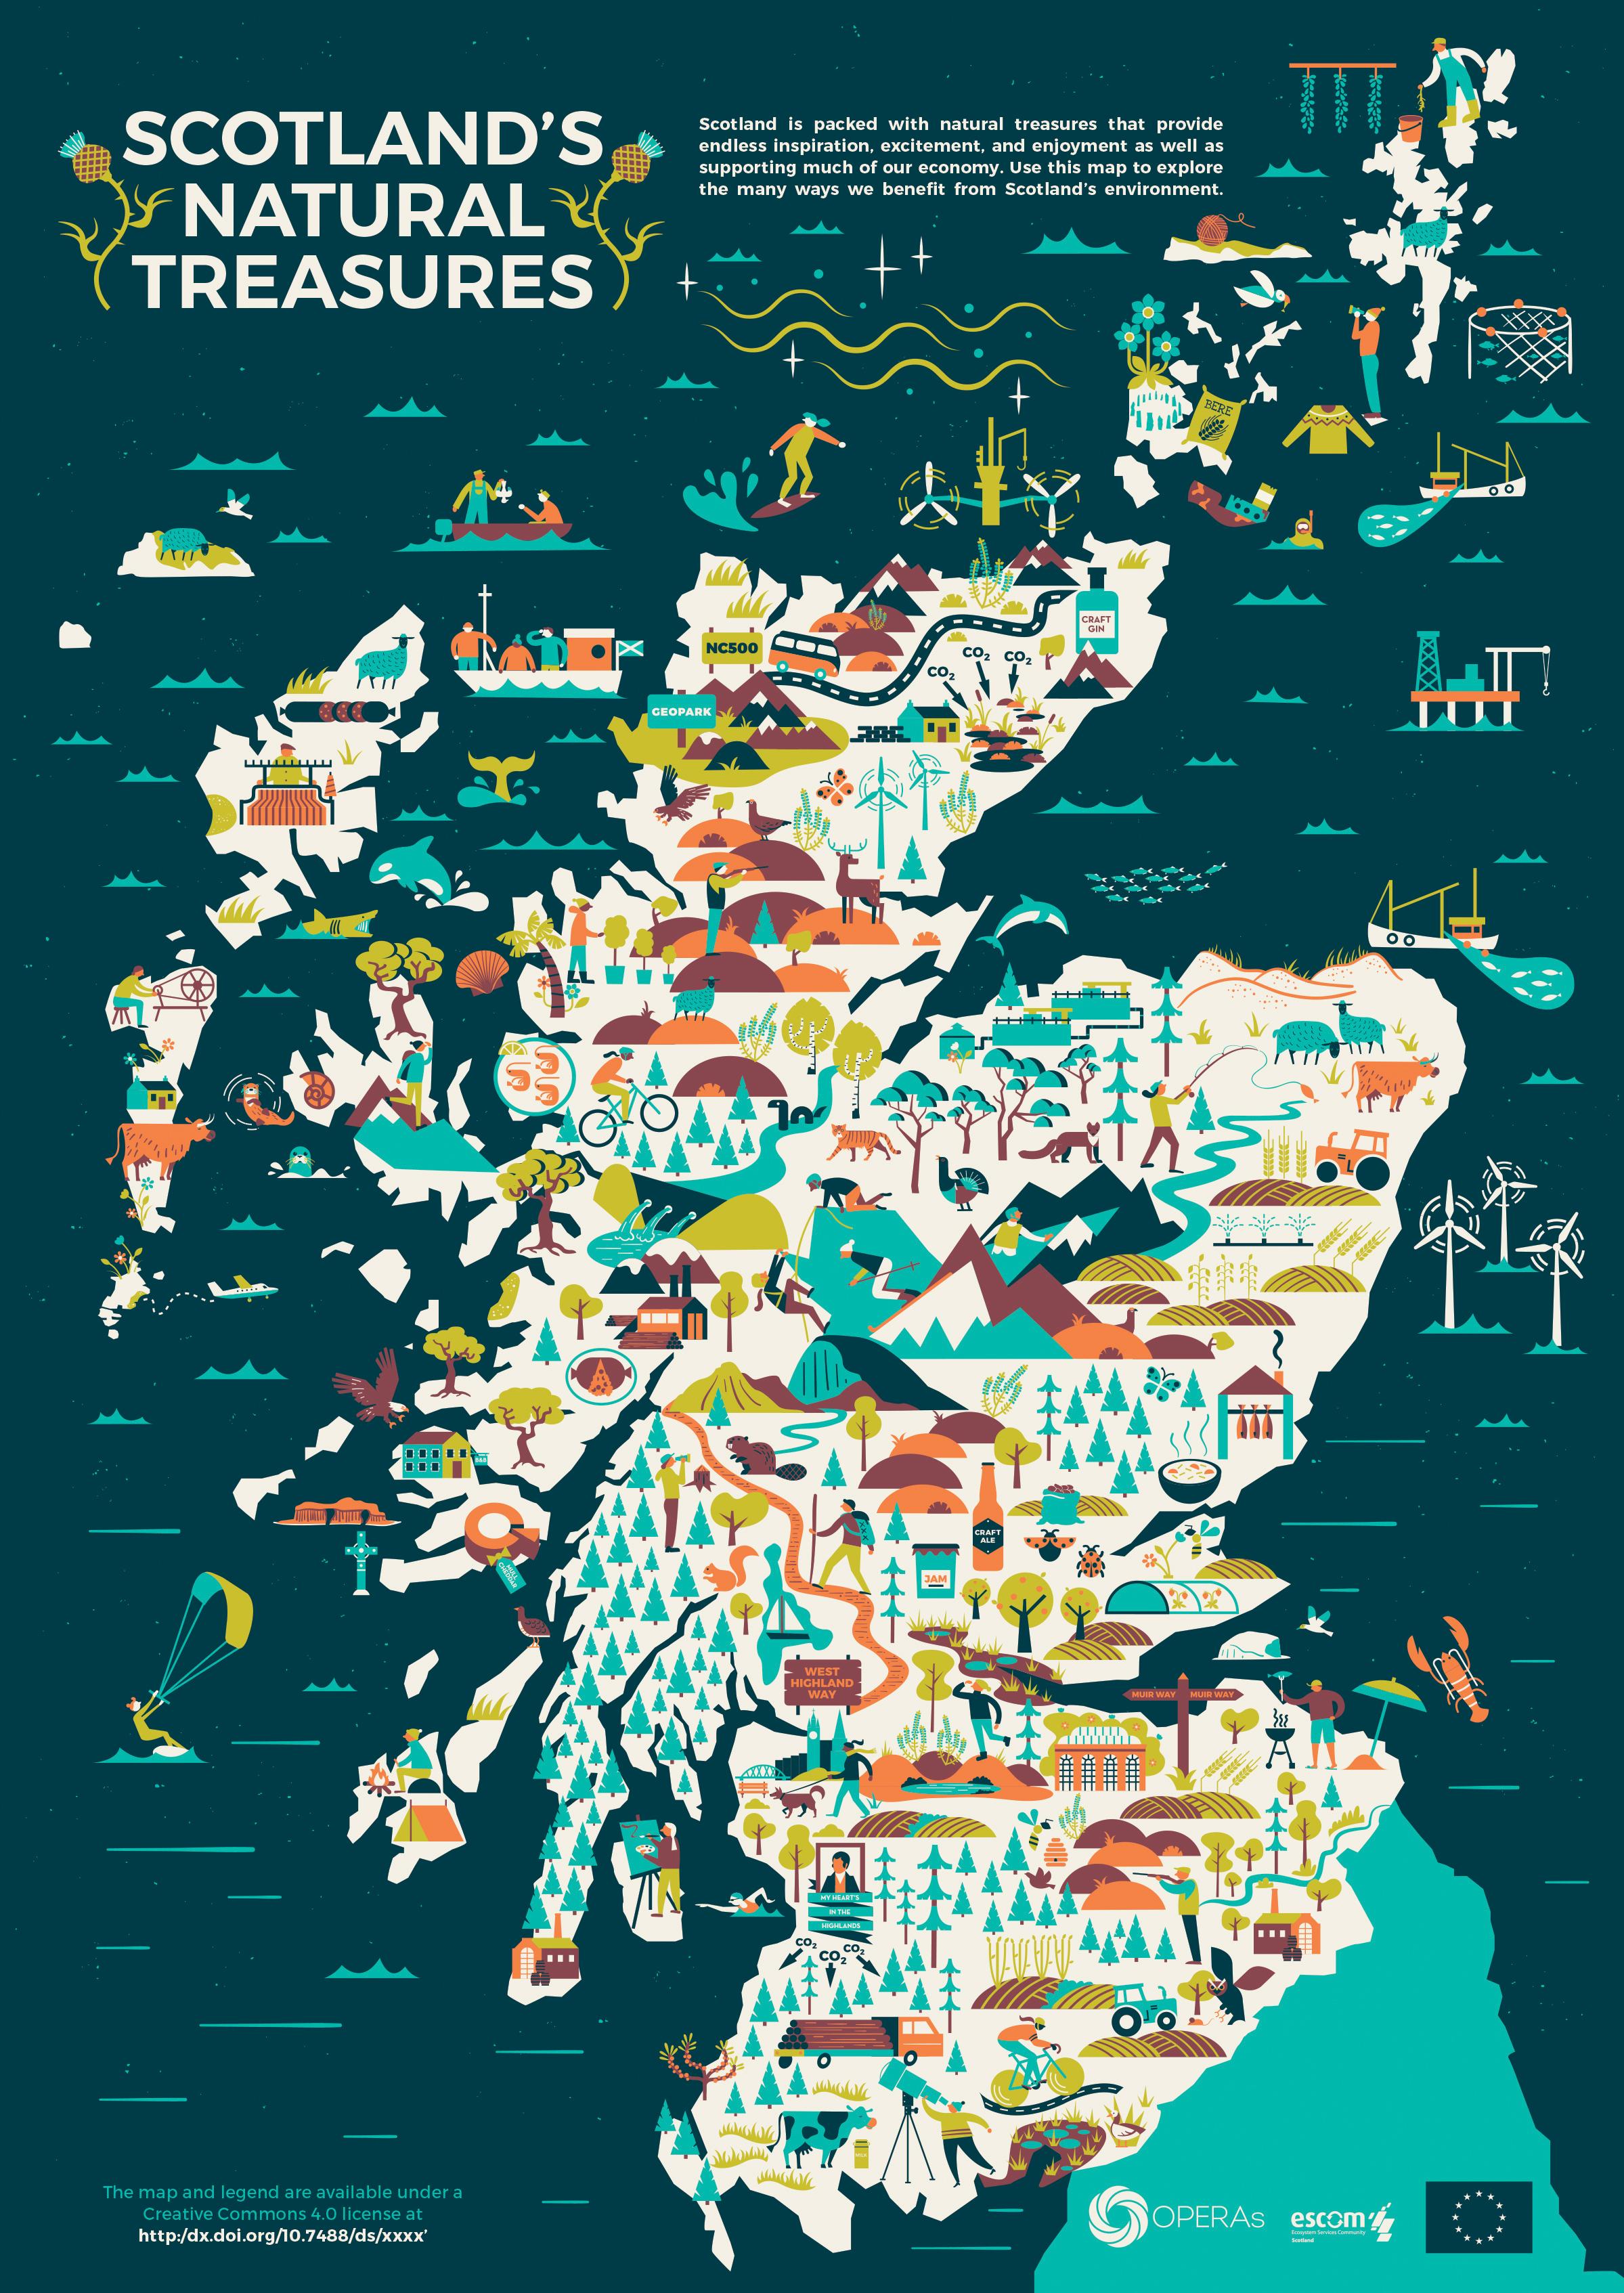 SCOTLANDS_NATIONAL_TREASURES_SCRIBERIA.jpg